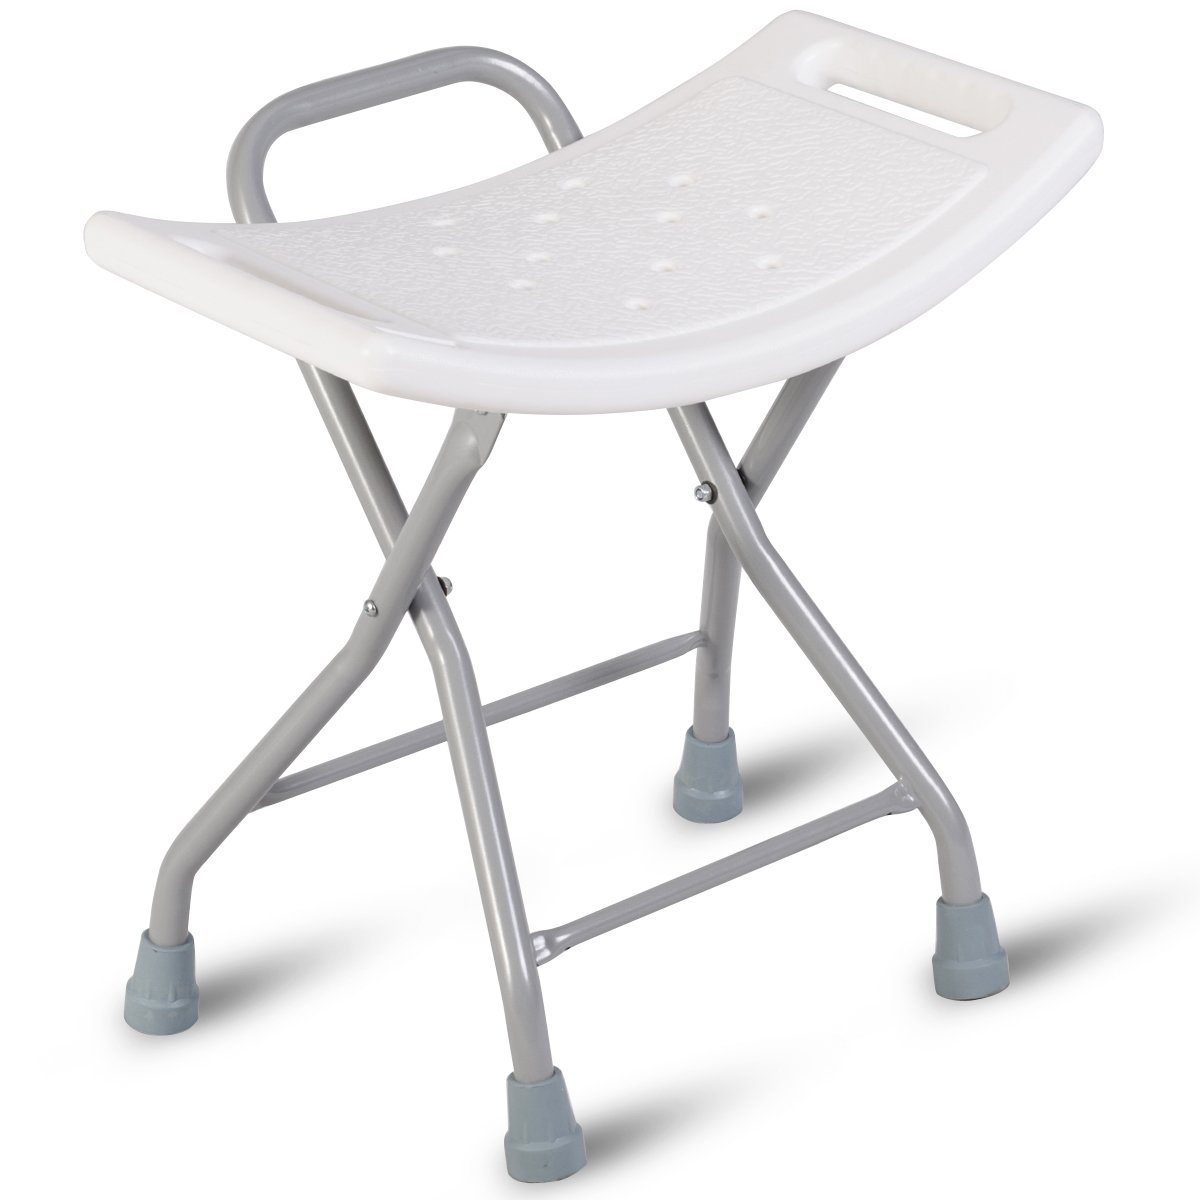 Giantex Folding Shower Chair Bath Seat Stool Bench No-Slip Stainless Foldable Portable Bath Stool